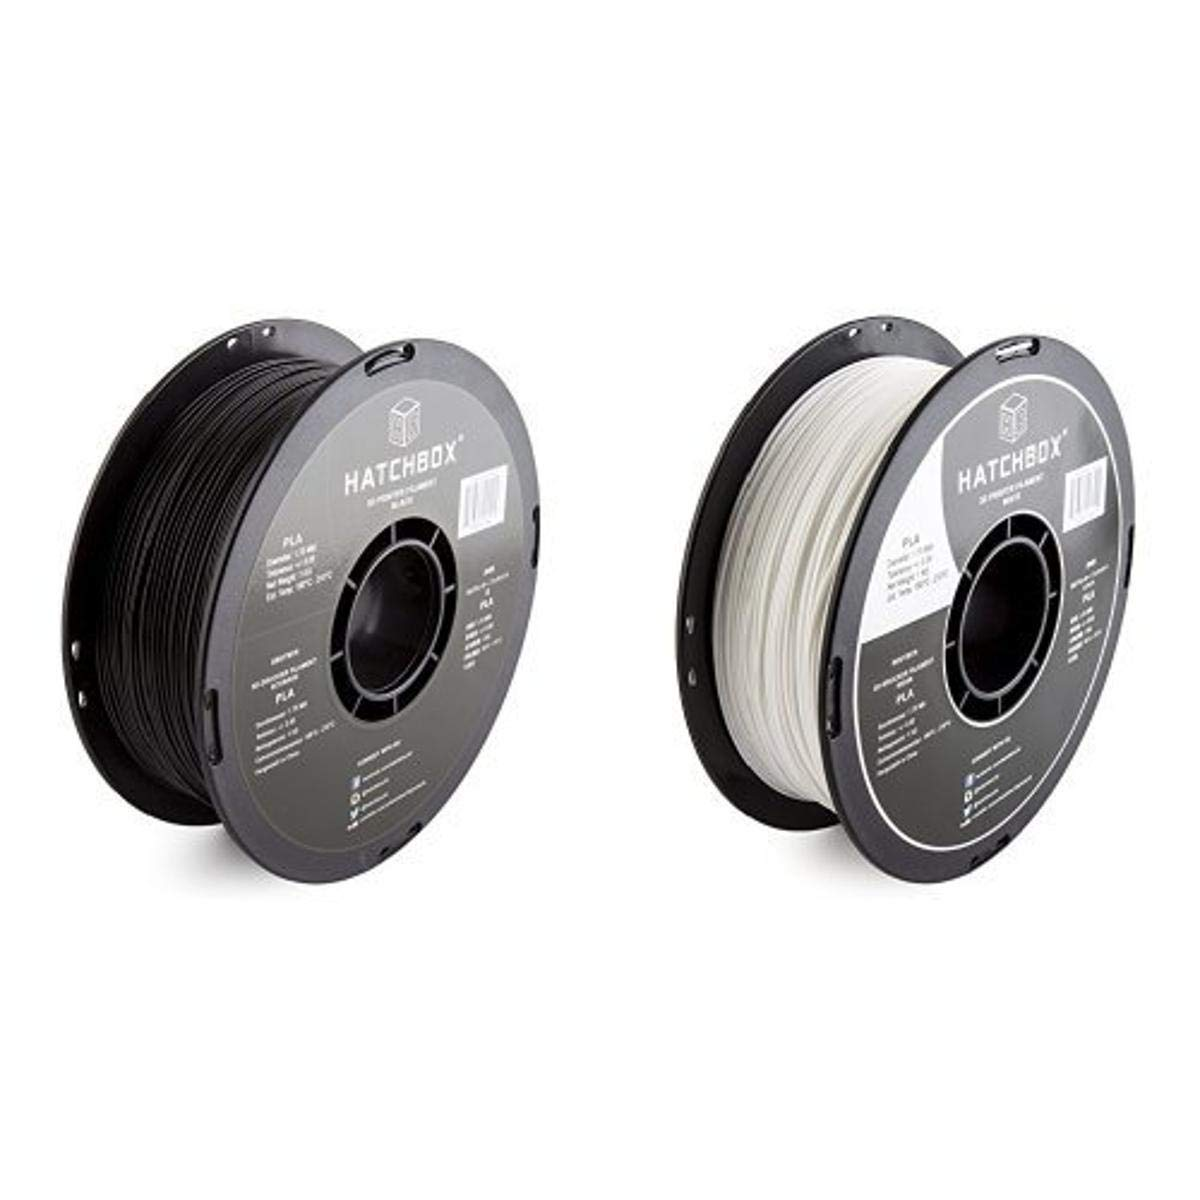 HATCHBOX 3D PLA-1KG1.75-BLK PLA 3D Printer Filament, Dimensional Accuracy +/- 0.05 mm